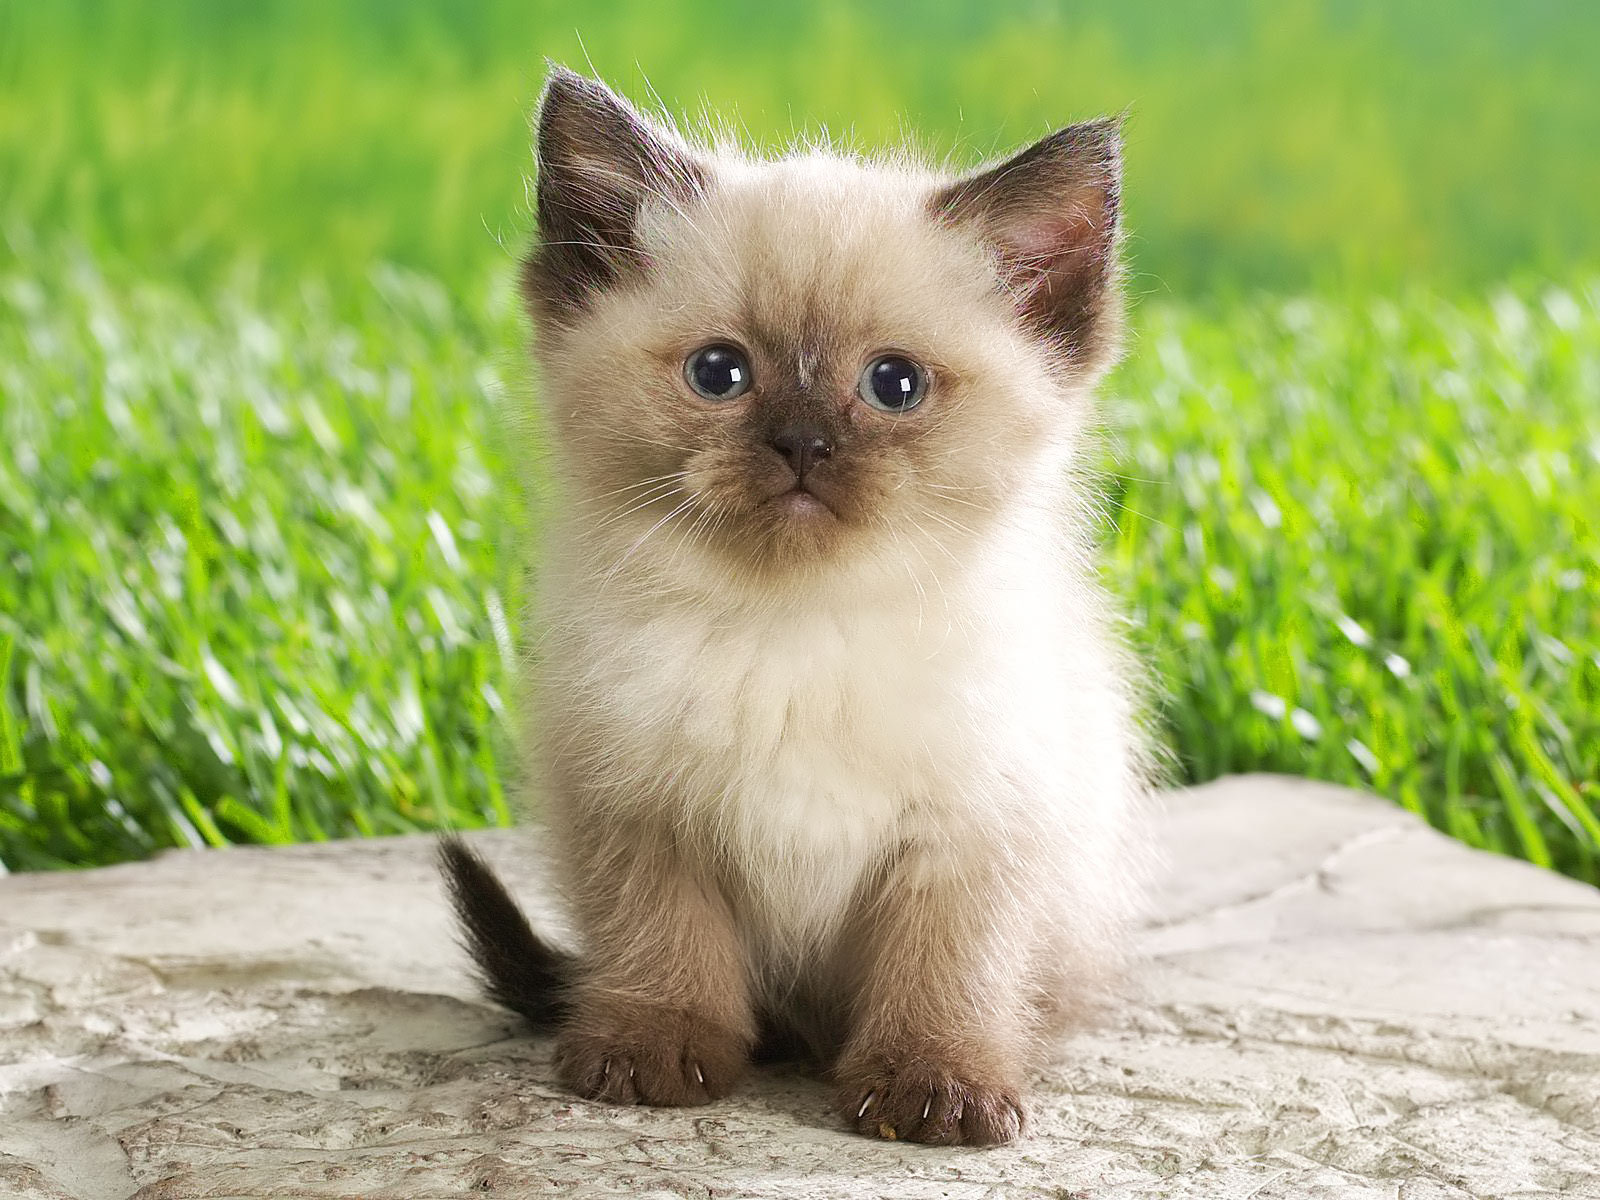 super cute animal pictures